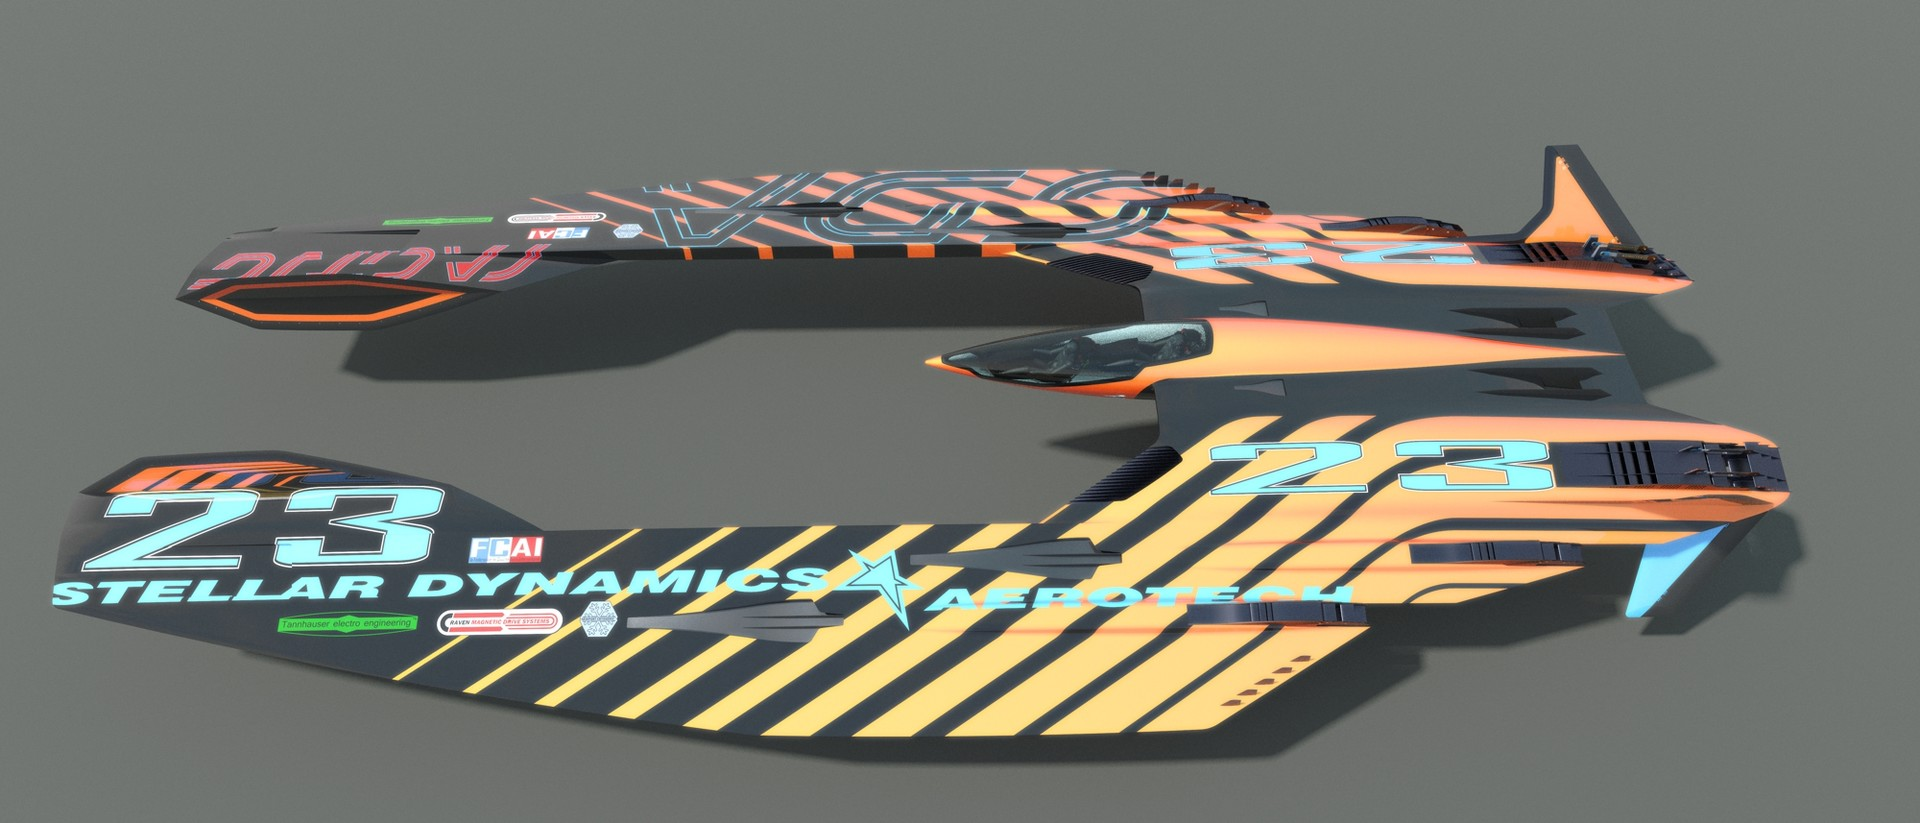 Joachim sverd martian aeroracer35